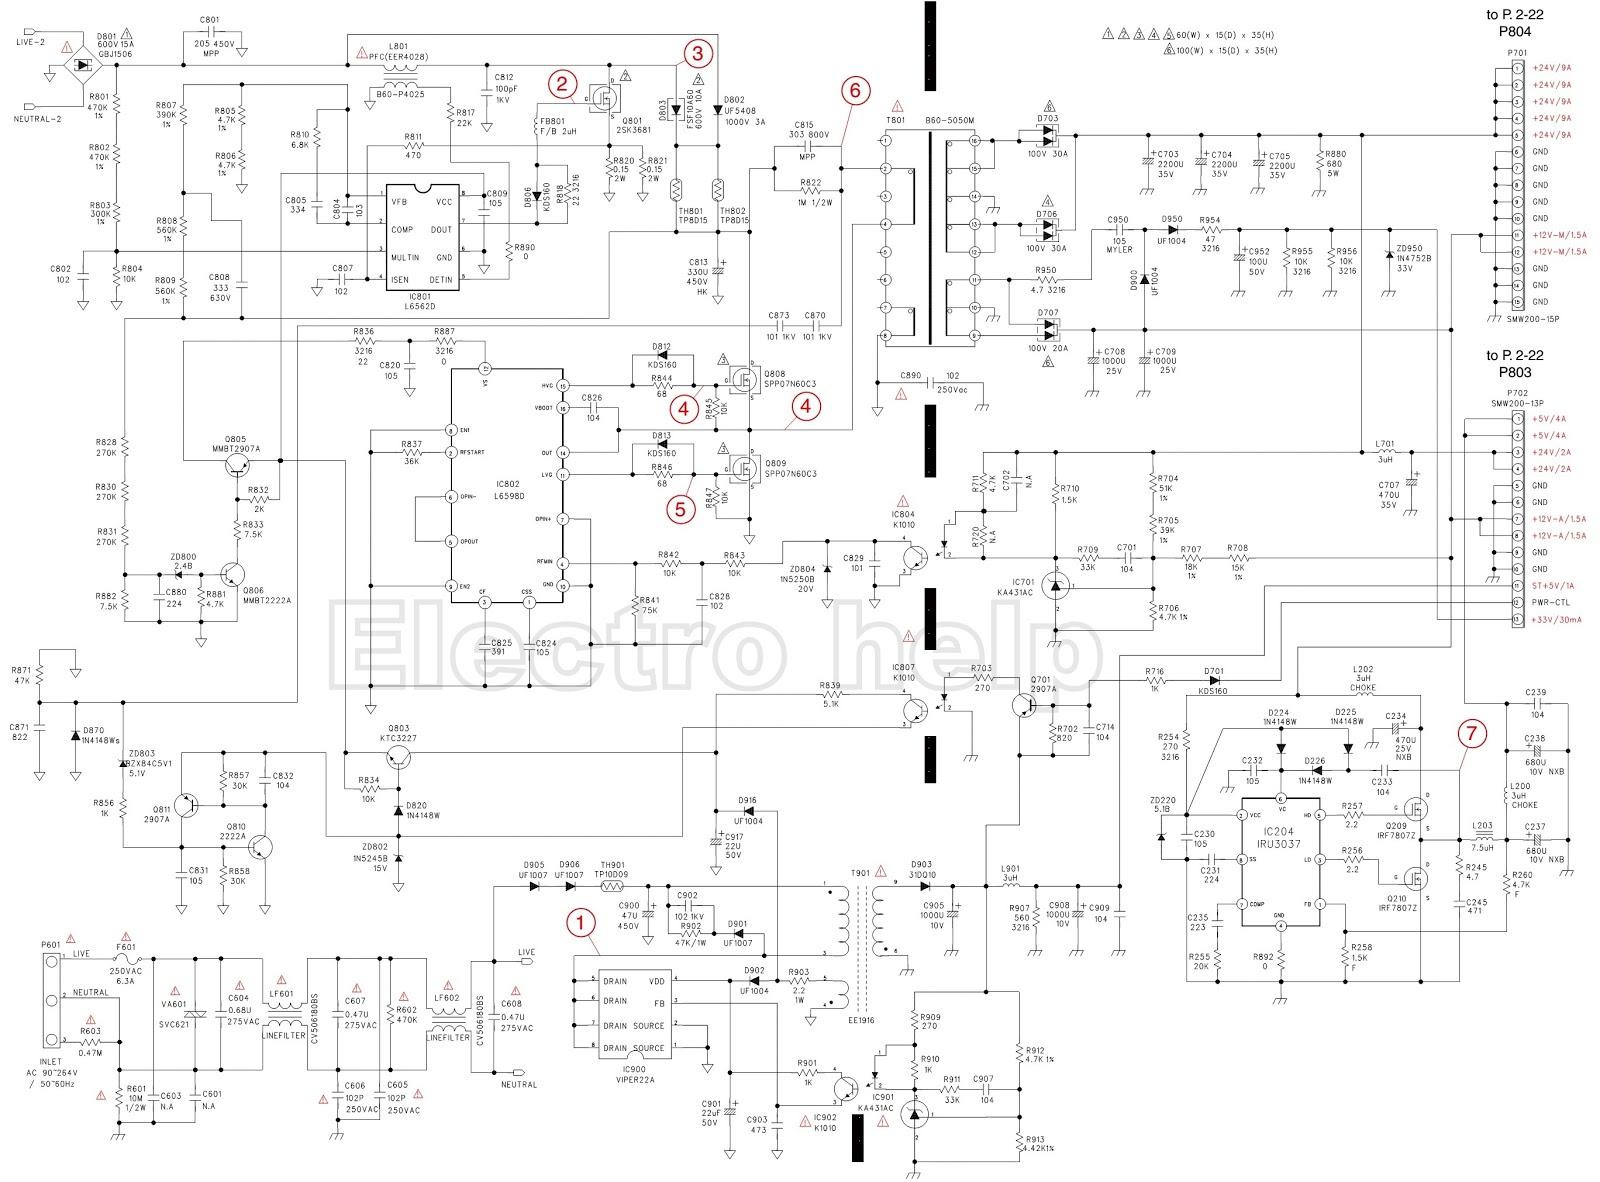 Smps schematic